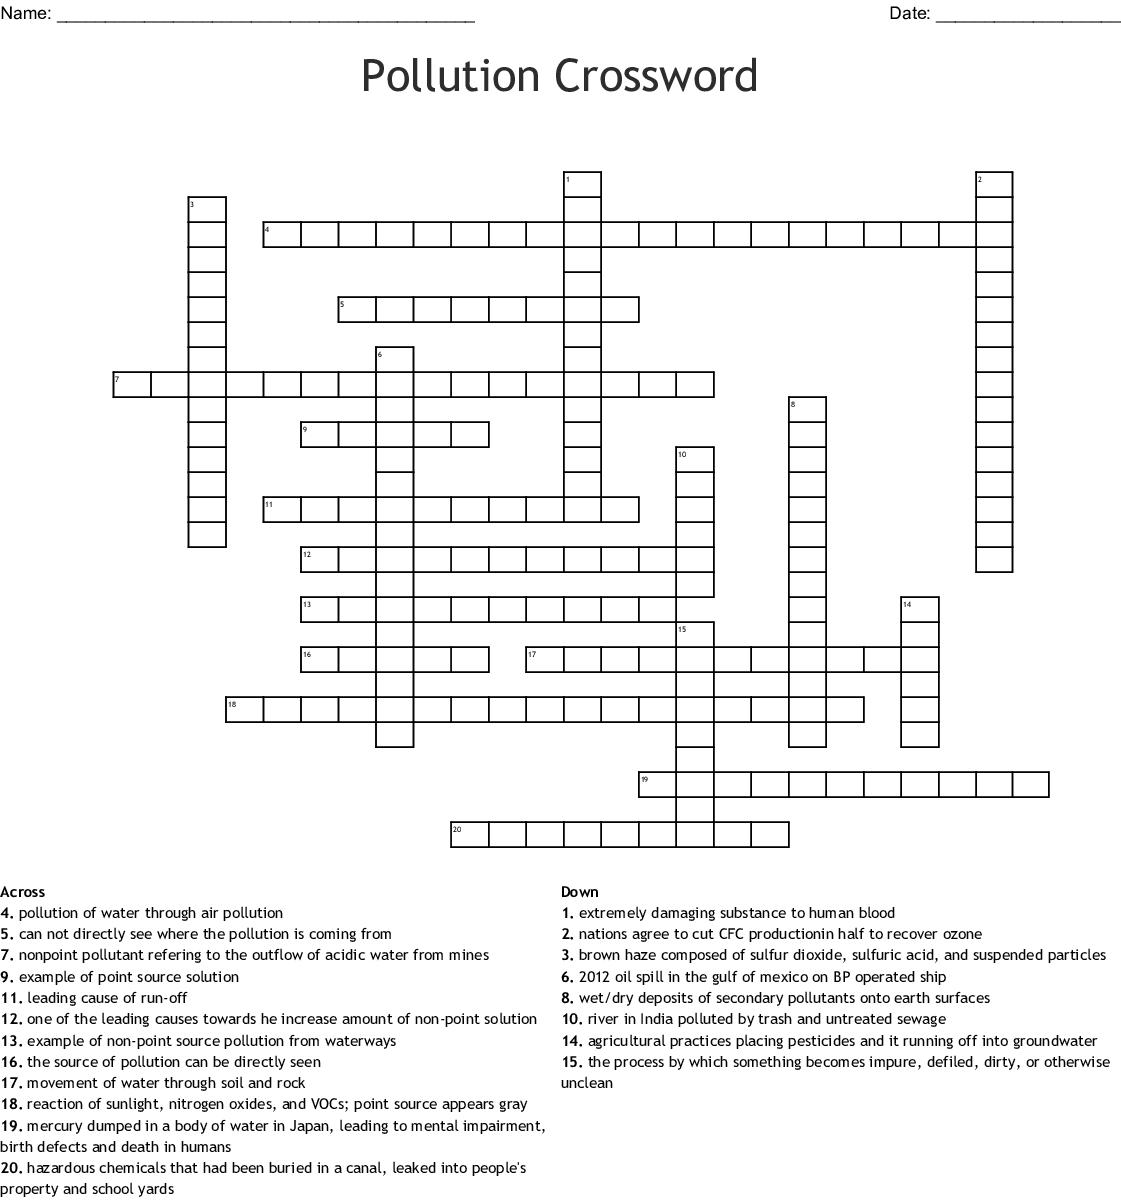 Pollution Crossword